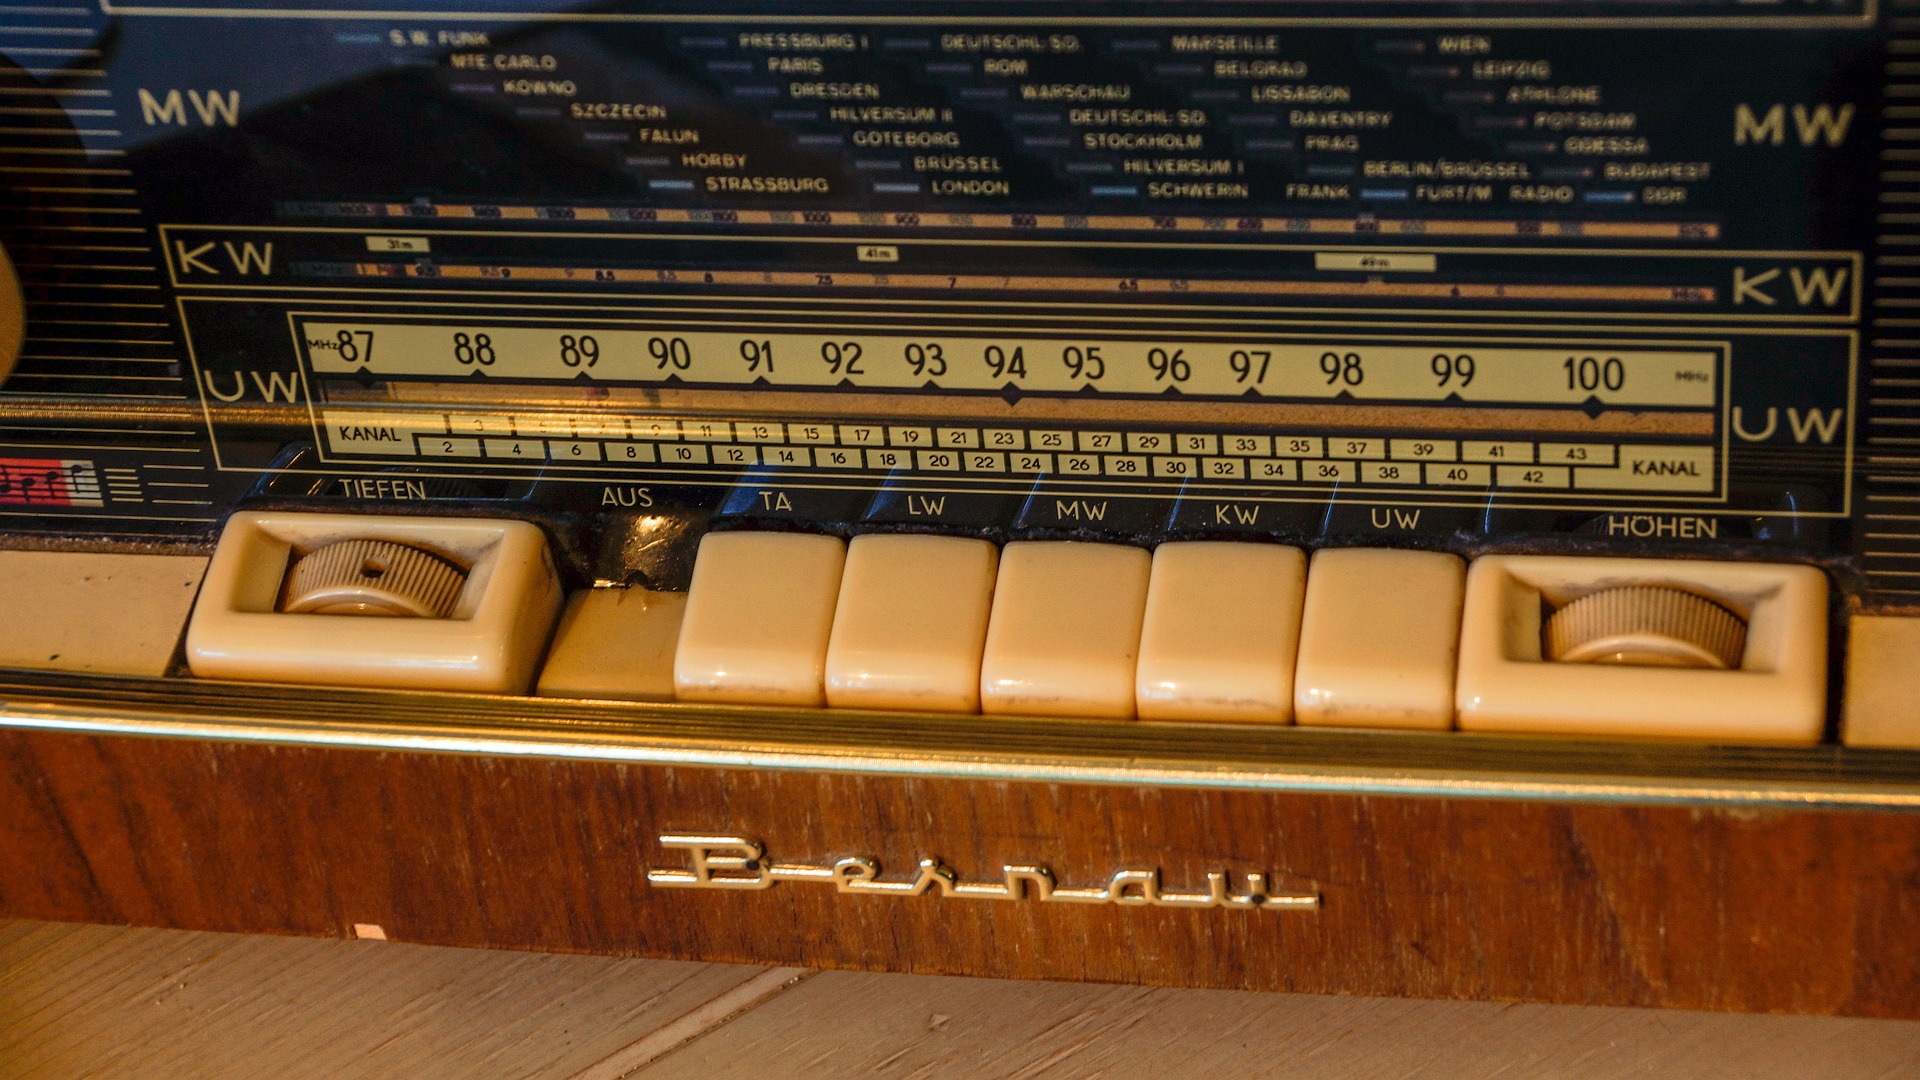 Radio-Retro Quelle: pixabay